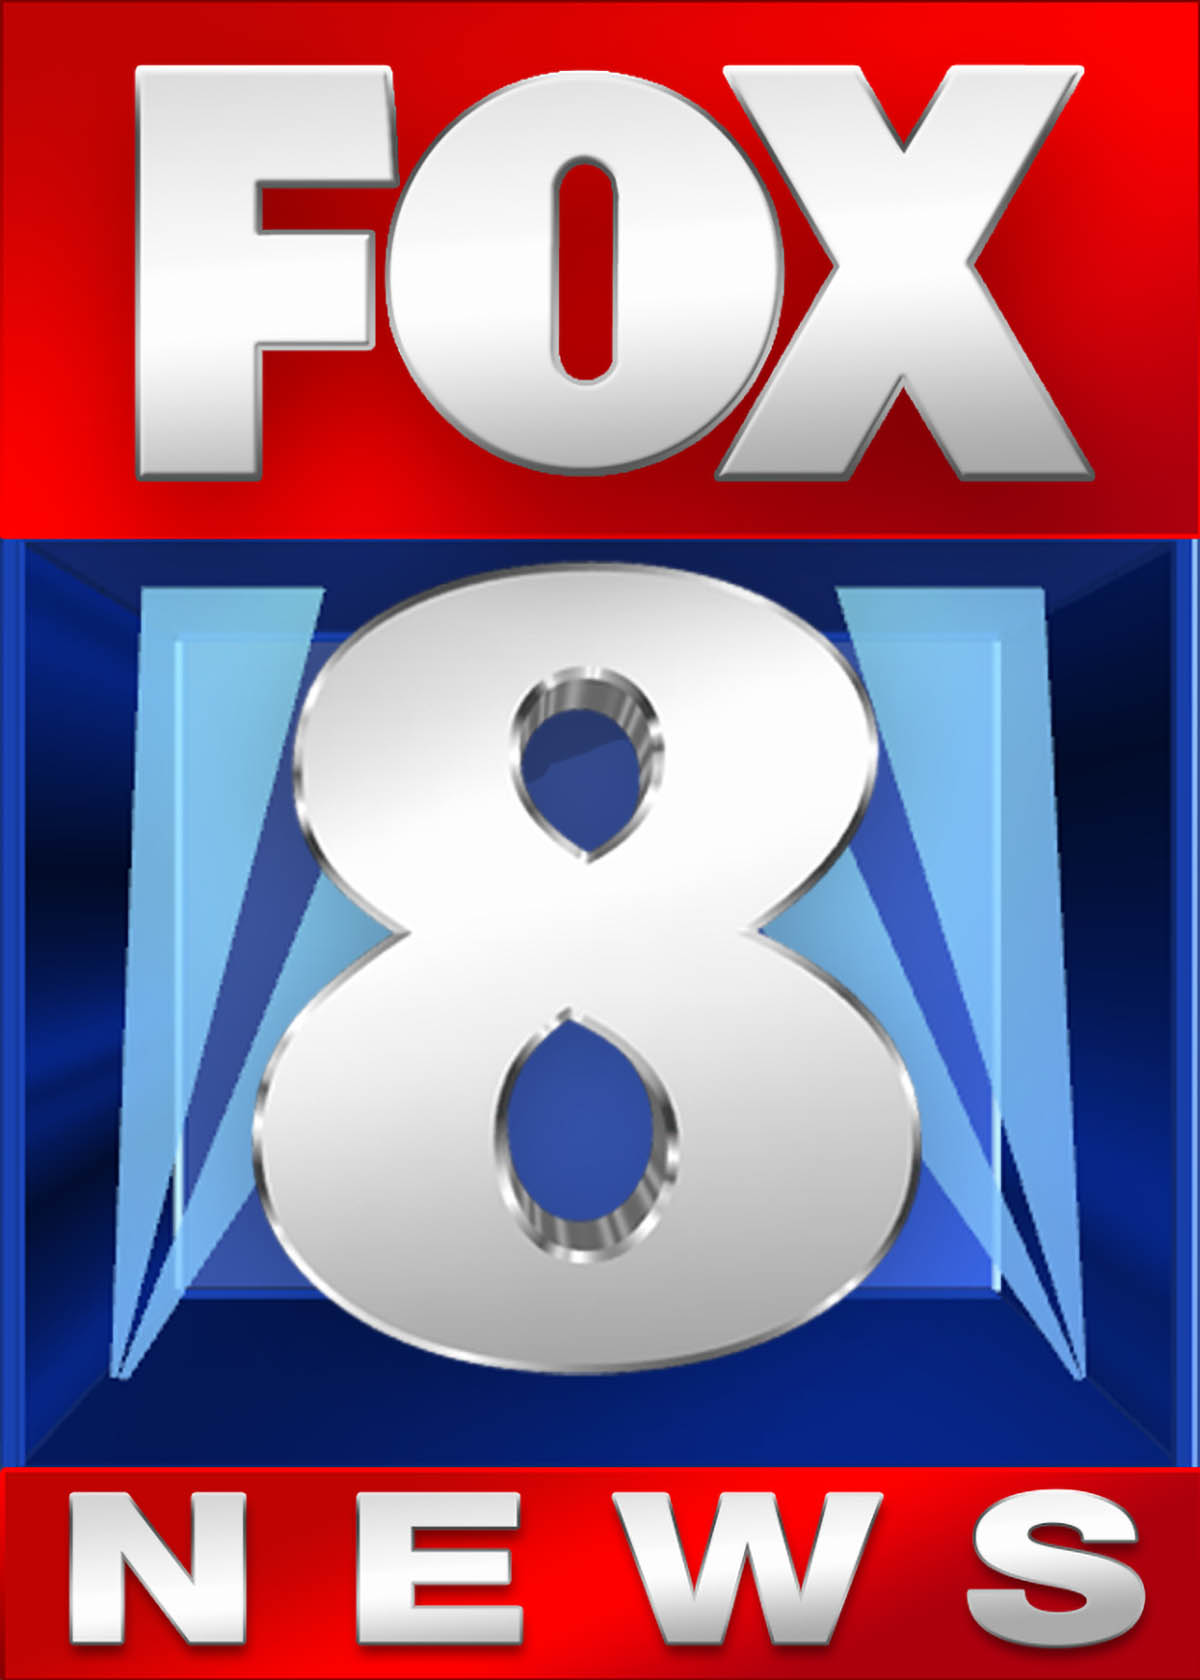 Fox 8 News Cleveland logo